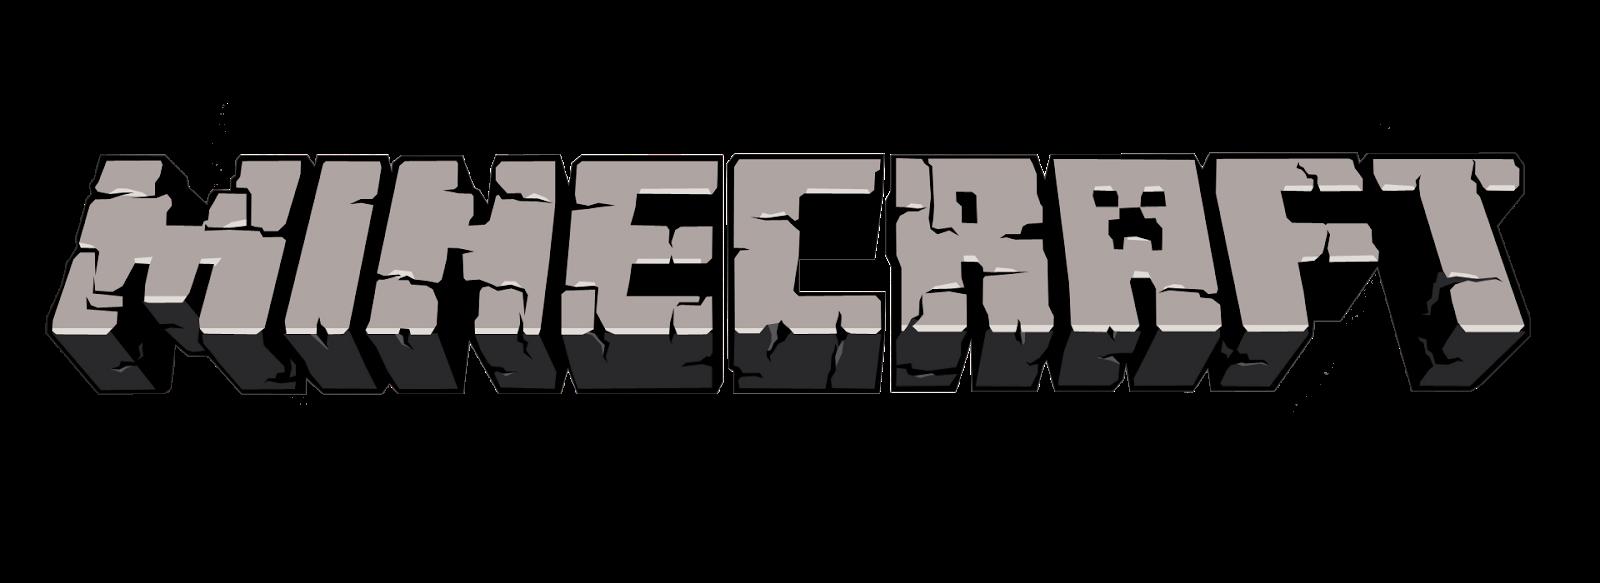 Free Minecraft Cliparts Download Free Clip Art Free Clip